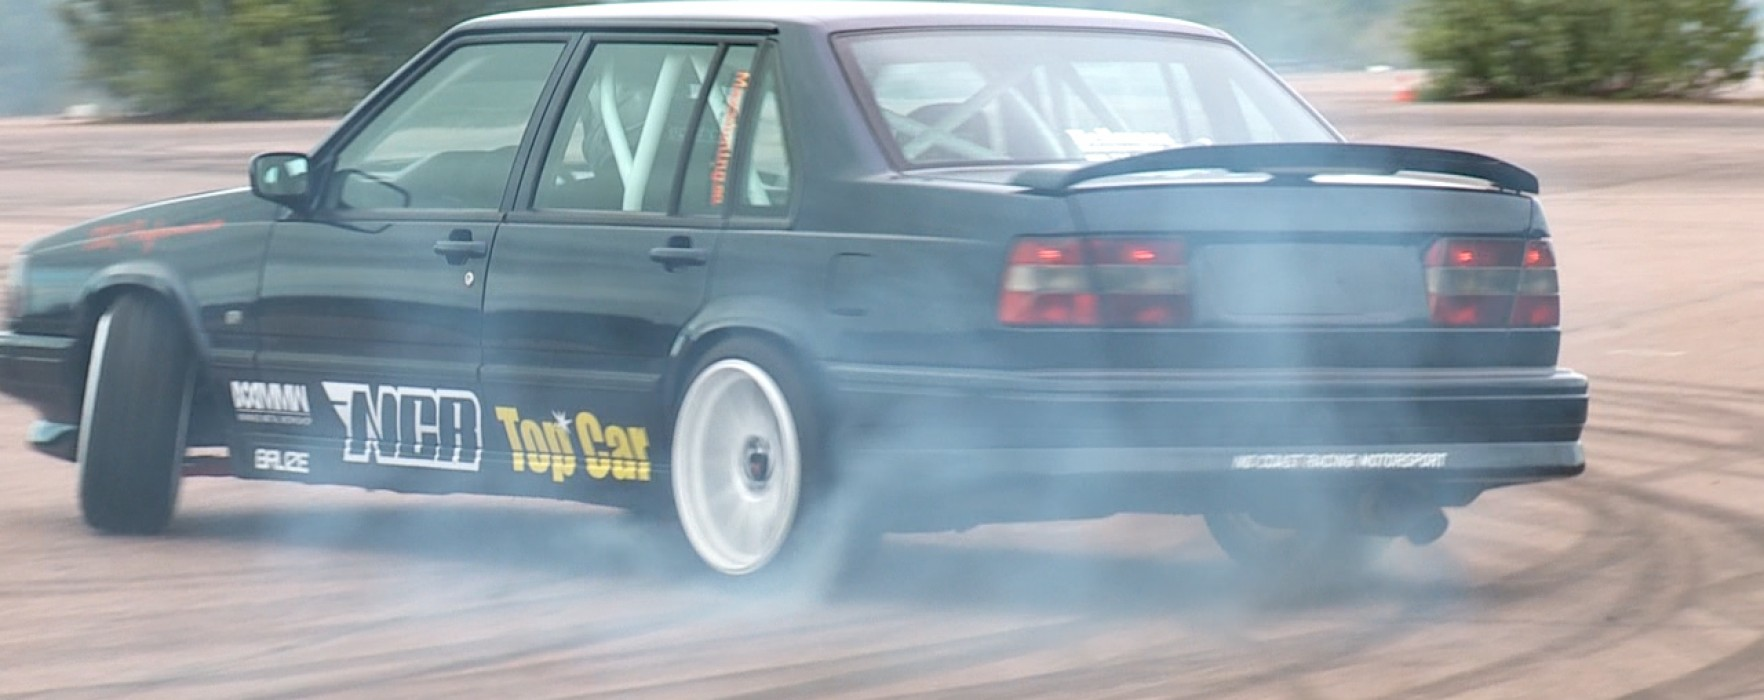 Glimt Sport – KDR Motordag